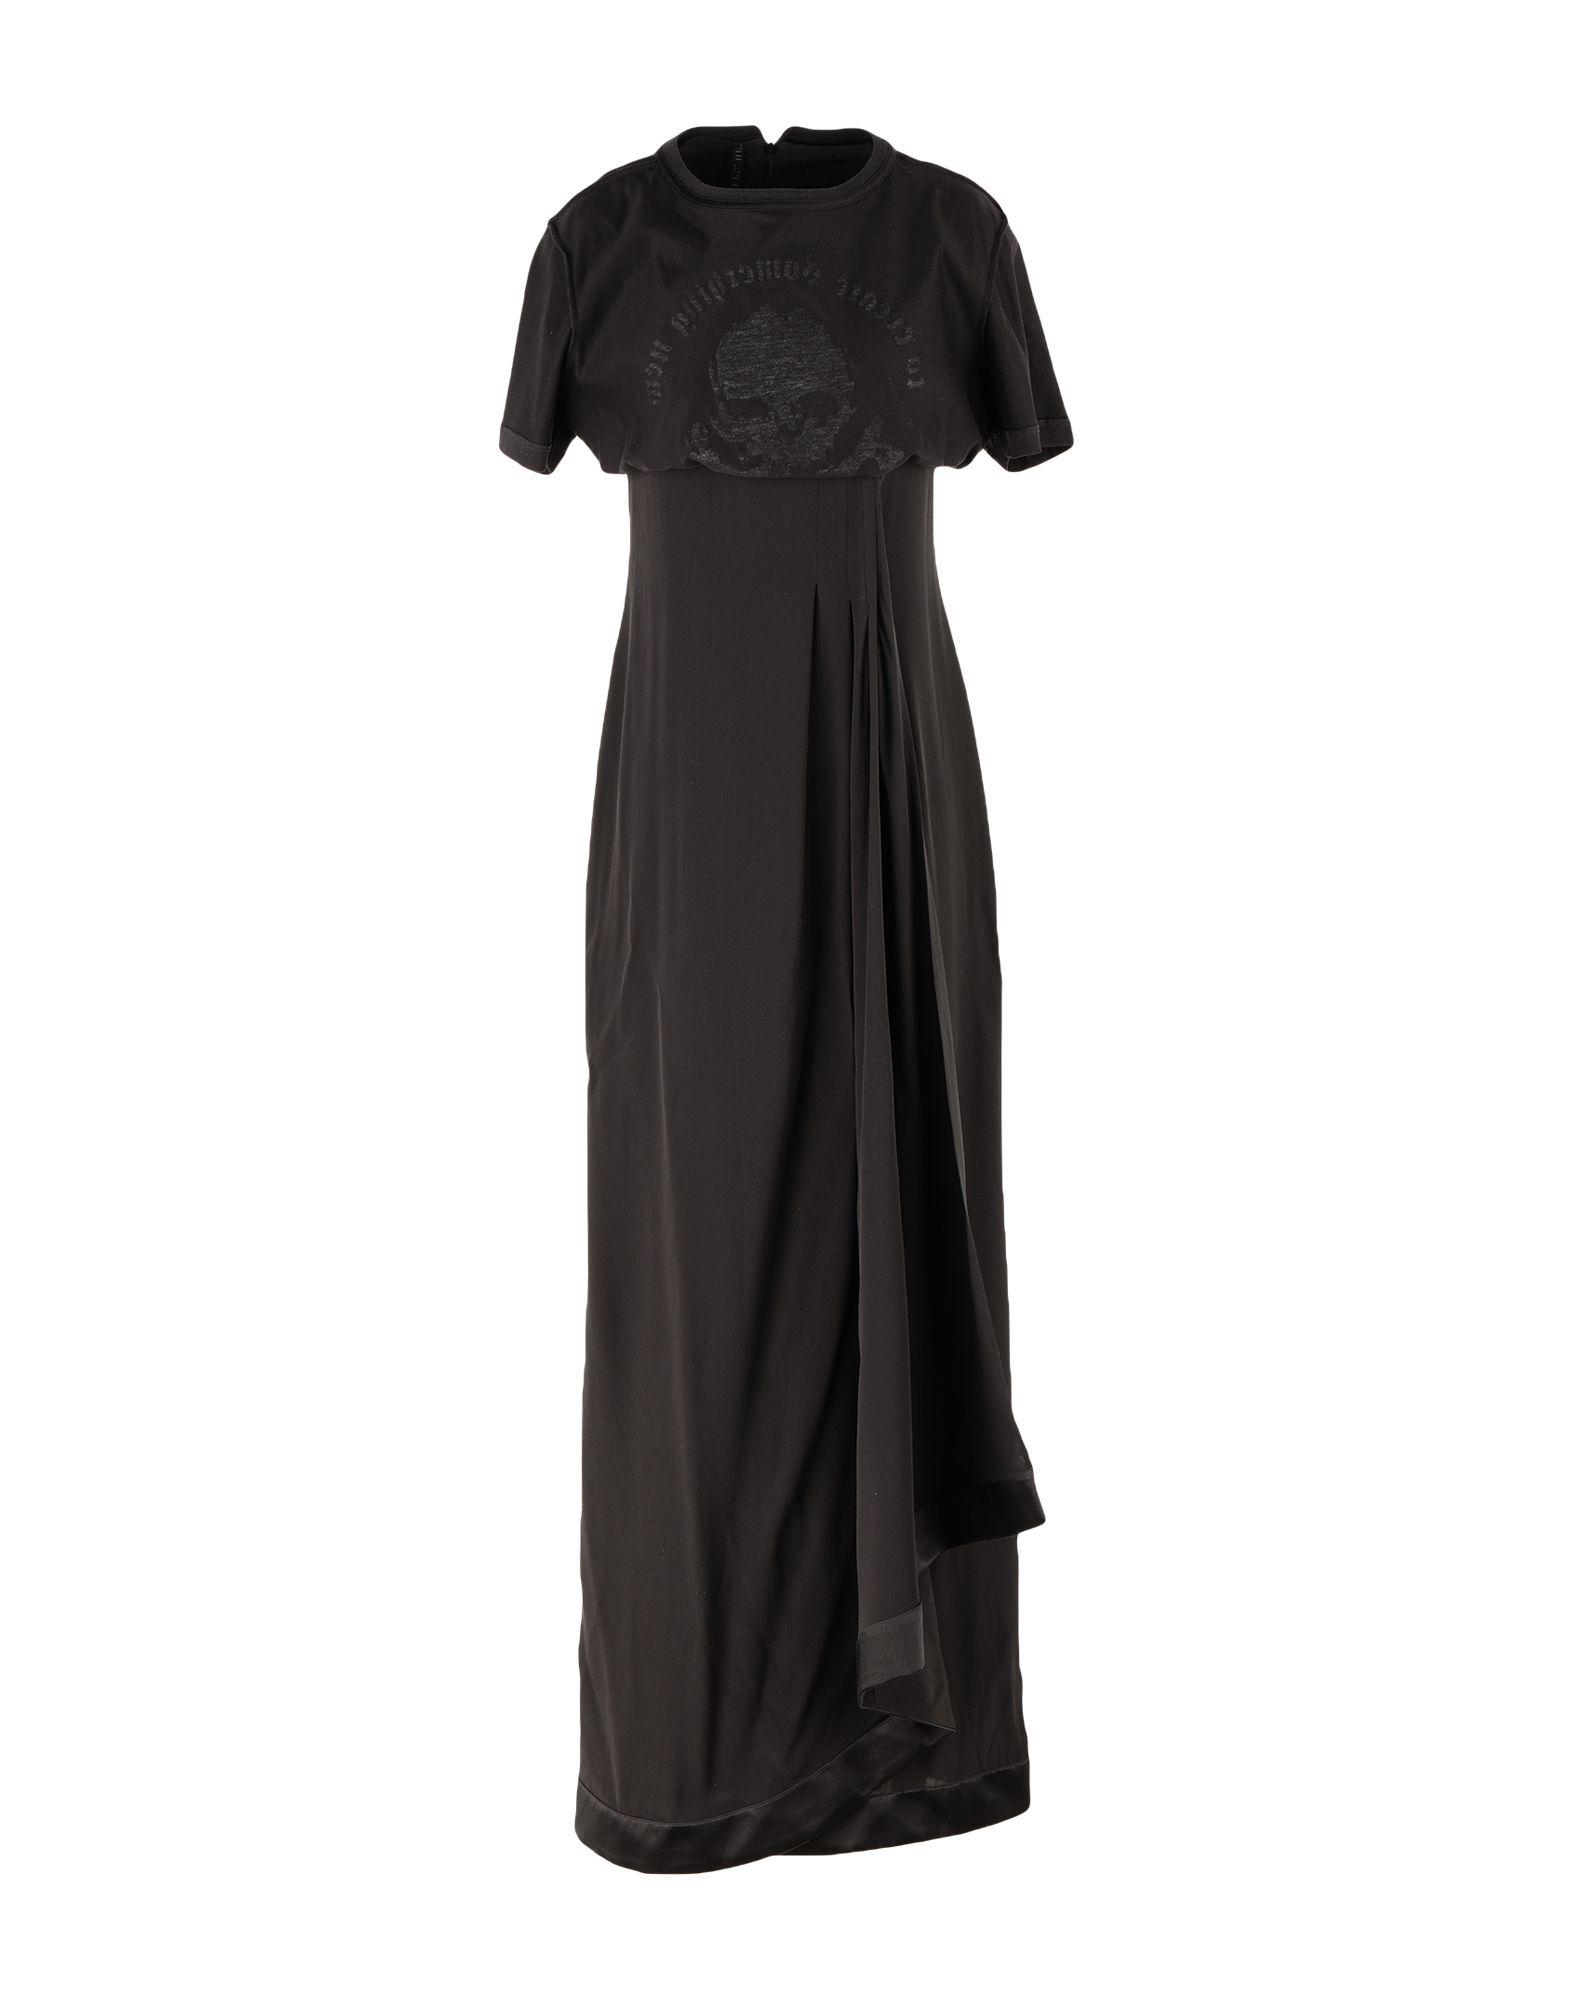 BEN TAVERNITI™ UNRAVEL PROJECT Платье до колена